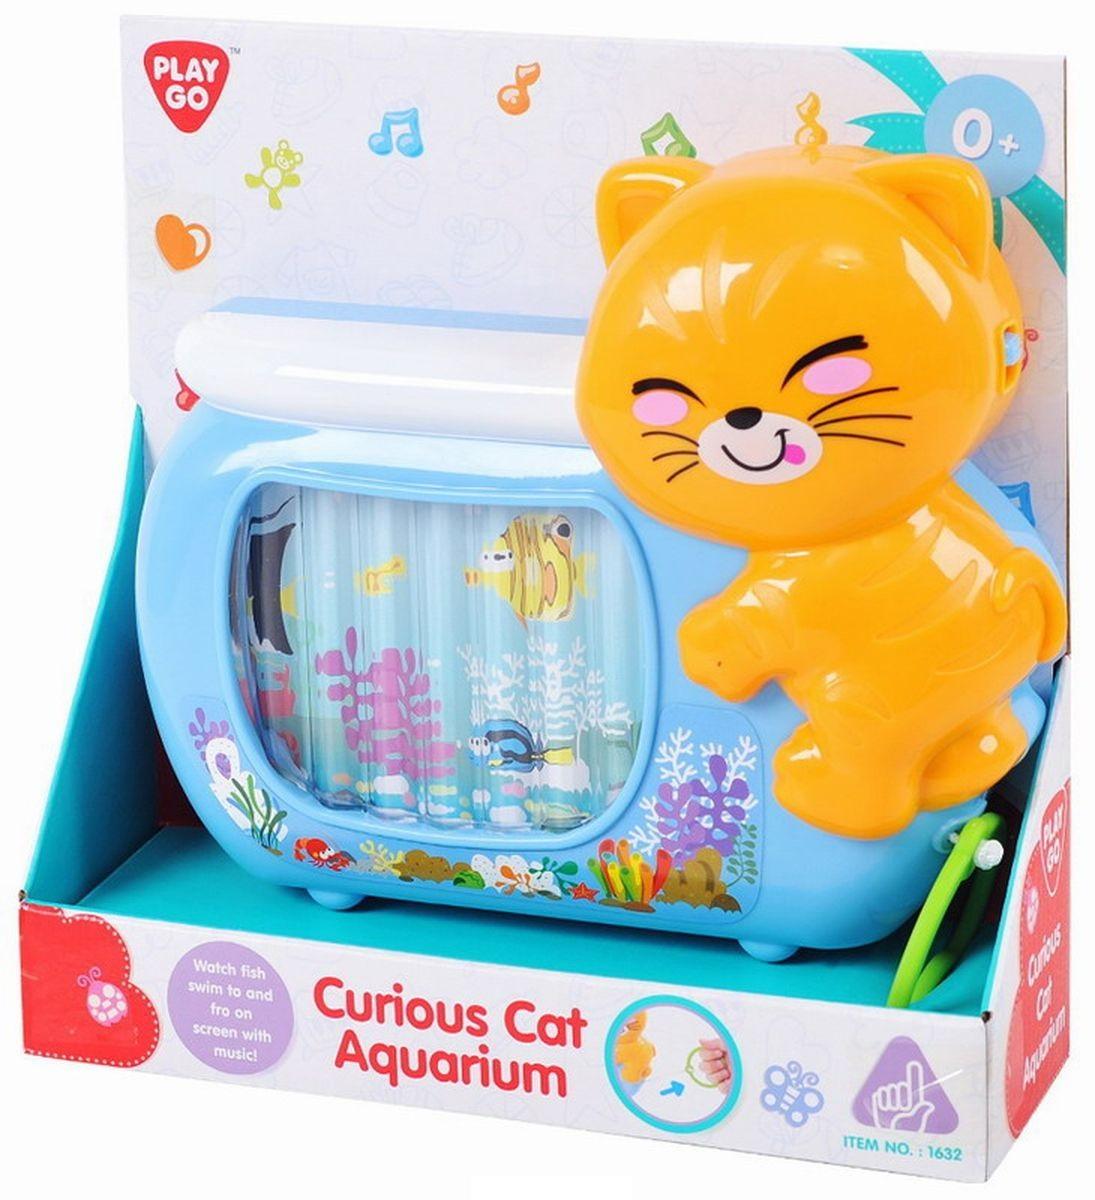 Развивающая игрушка - Аквариум с кошкойРазвивающие игрушки PlayGo<br>Развивающая игрушка - Аквариум с кошкой<br>